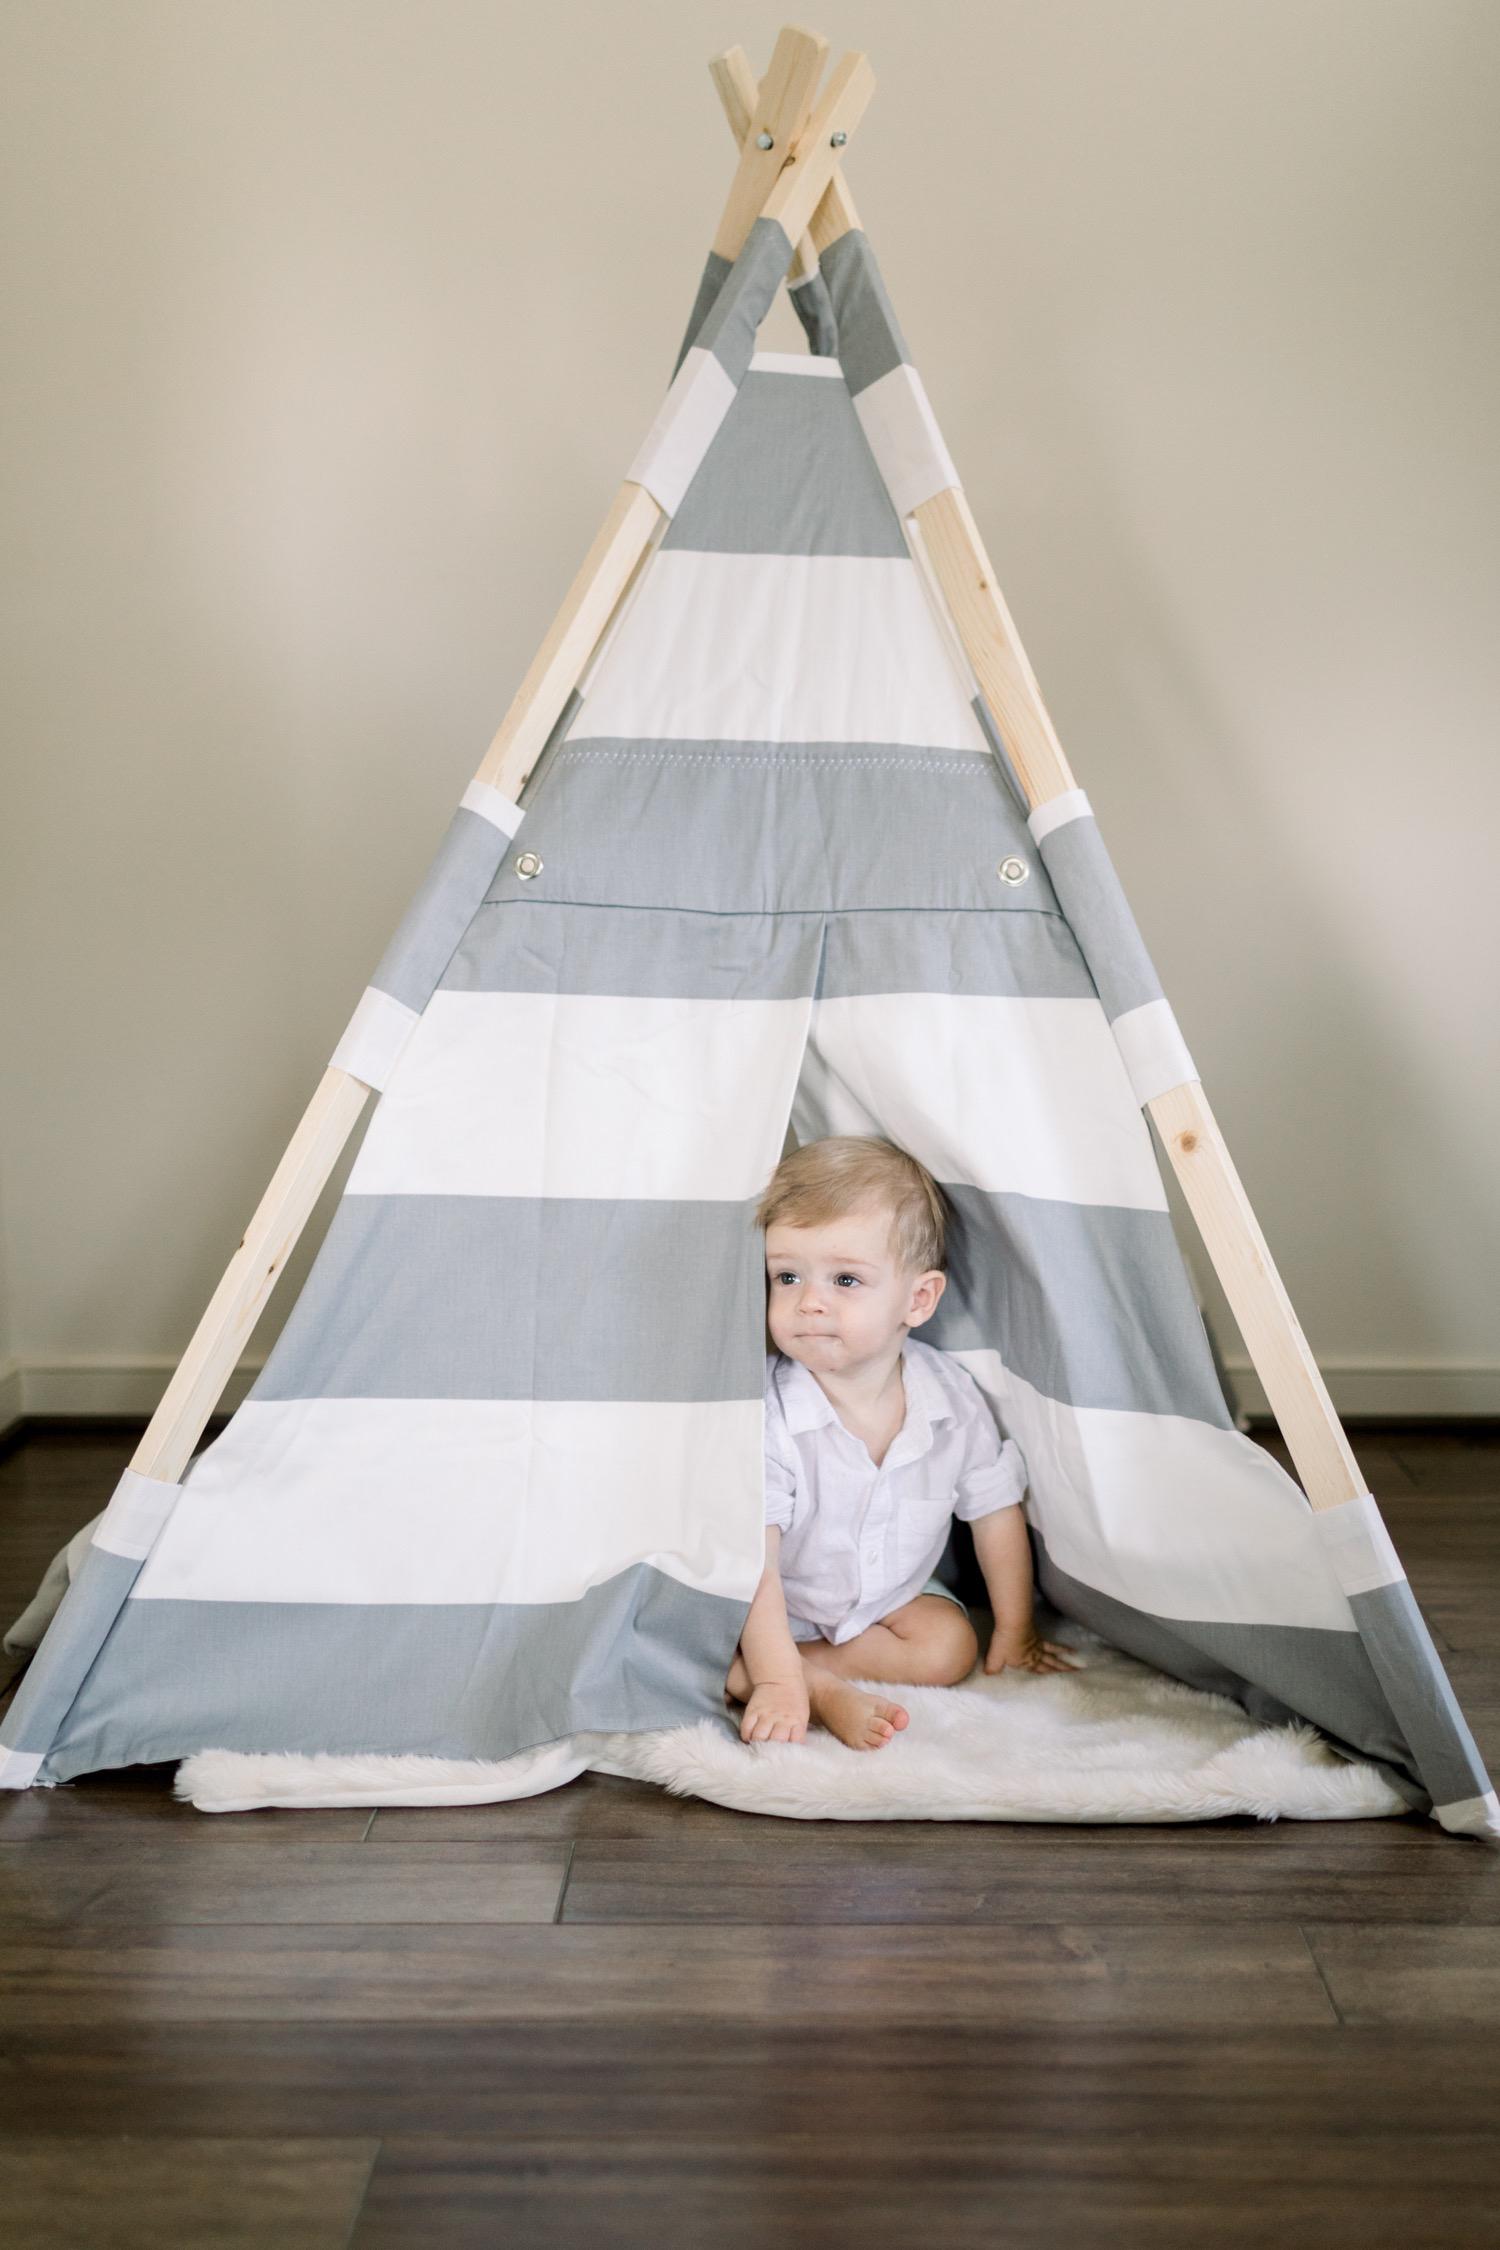 180805-0084-baby-boy-at-home-session-washington-dc-elisenda-llinares.jpg